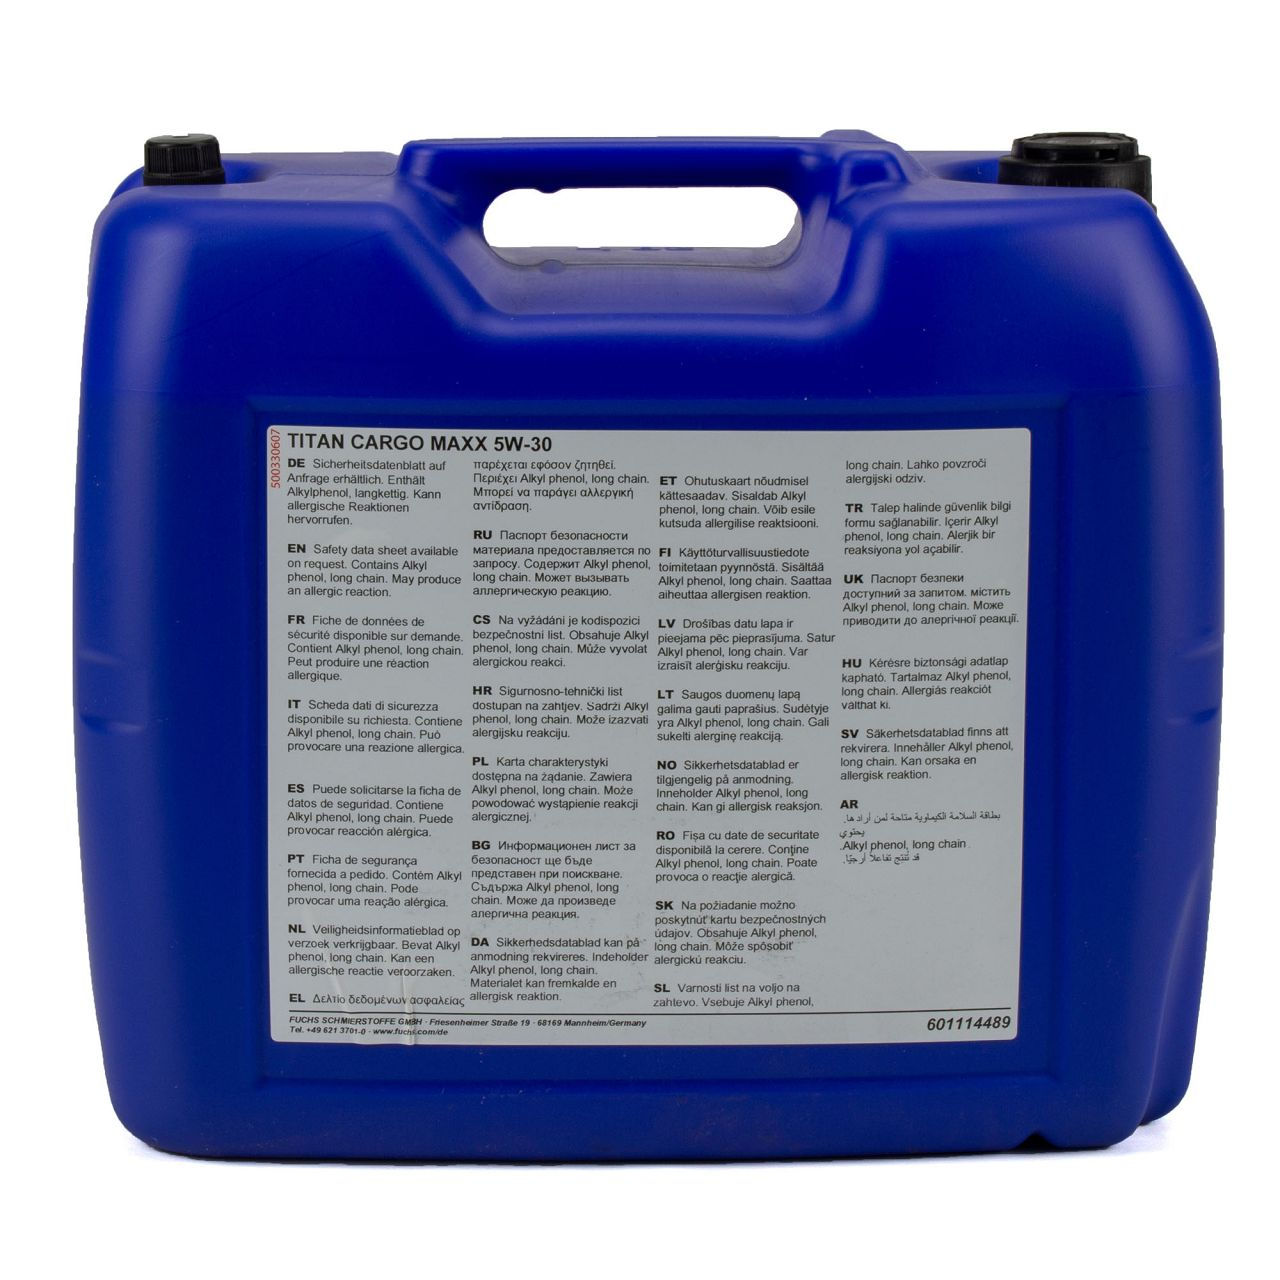 FUCHS Motoröl Öl TITAN CARGO MAXX 5W-30 5W30 NFZ Dieselfahrzeuge - 20L 20 Liter